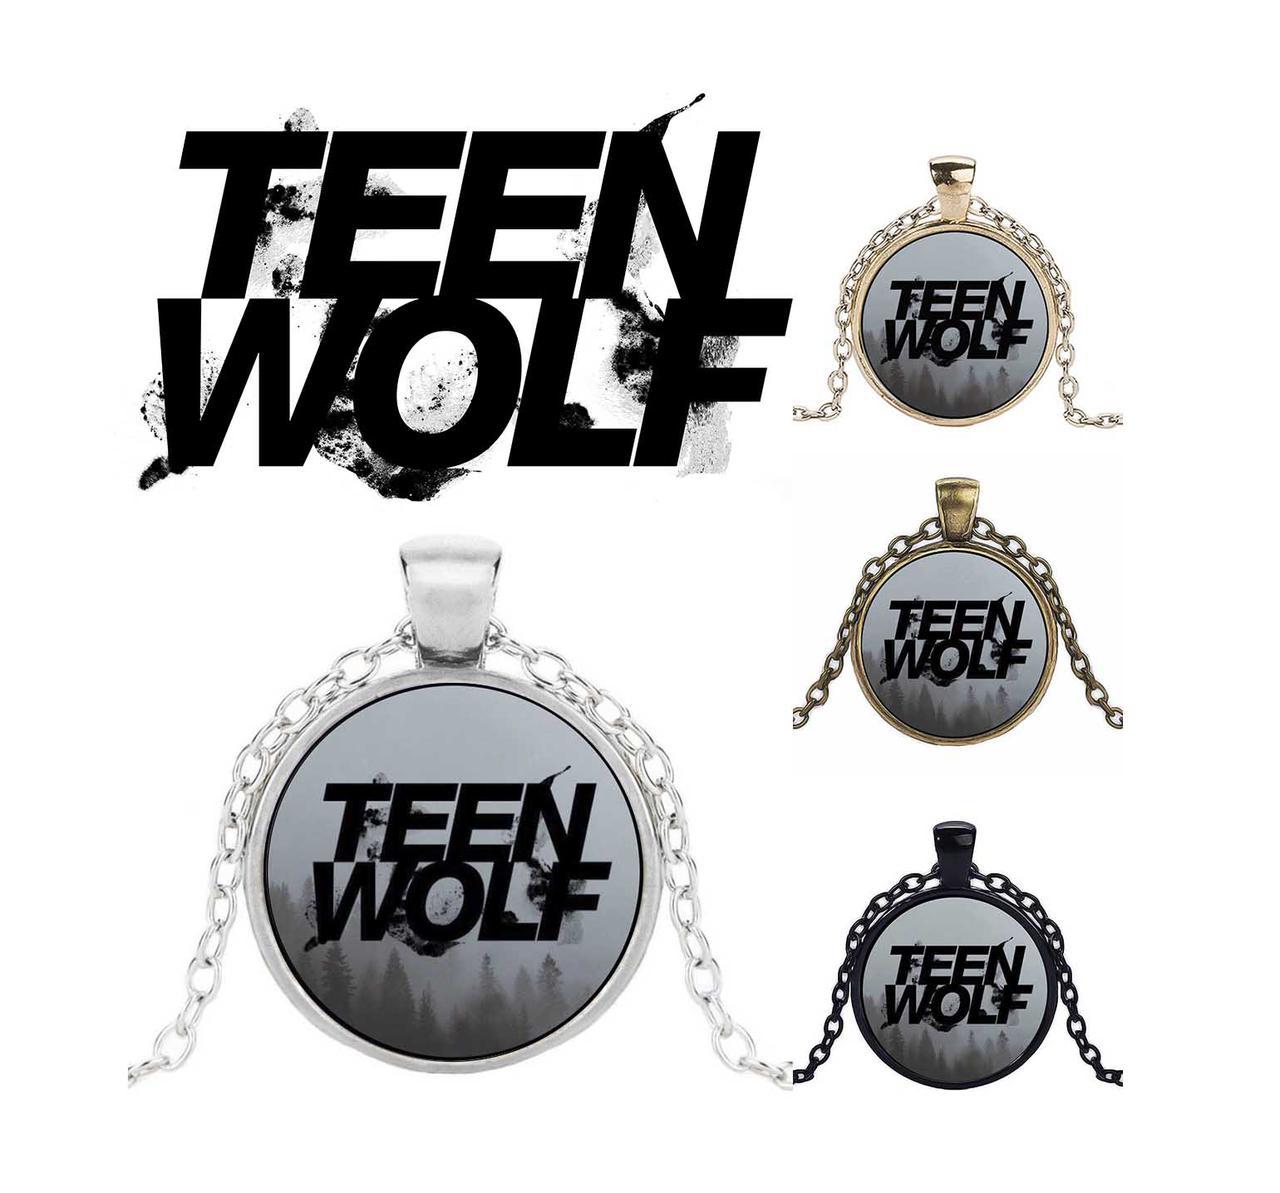 Кулон с изображением логотипа Teen Wolf Волчонок